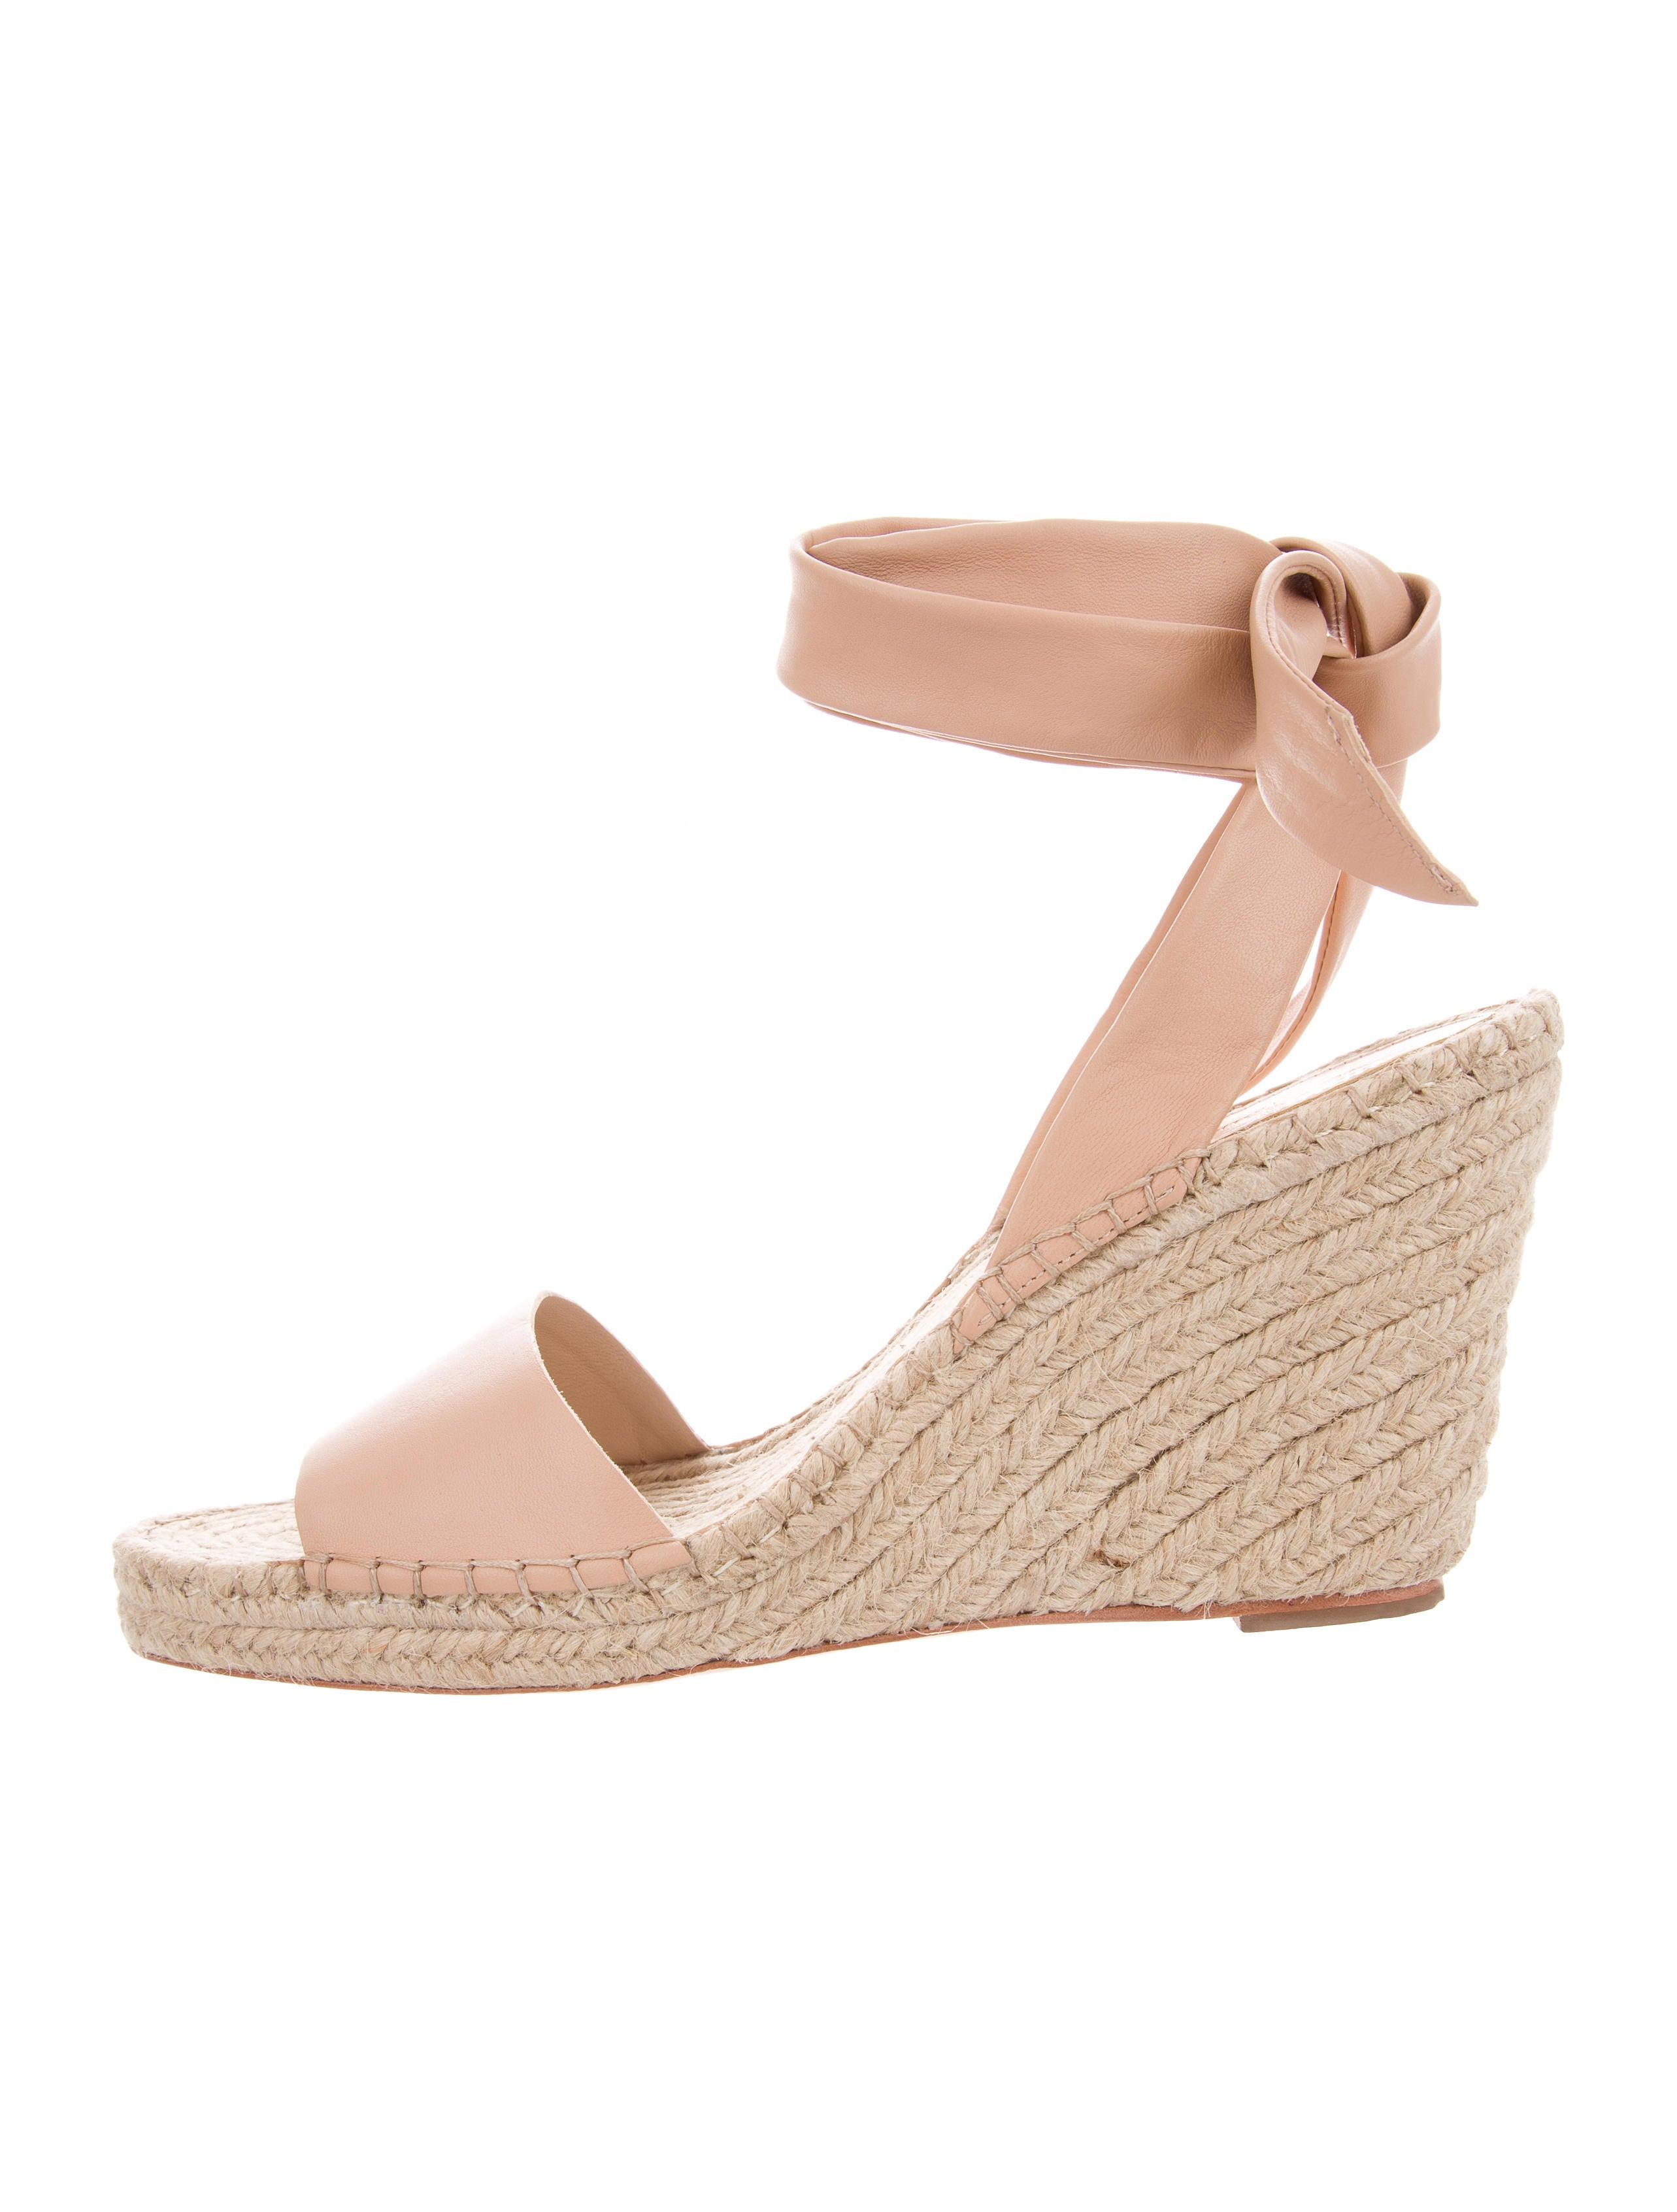 2014 cheap price free shipping discounts Loeffler Randall Harper Espadrille Sandals w/ Tags UlDbH